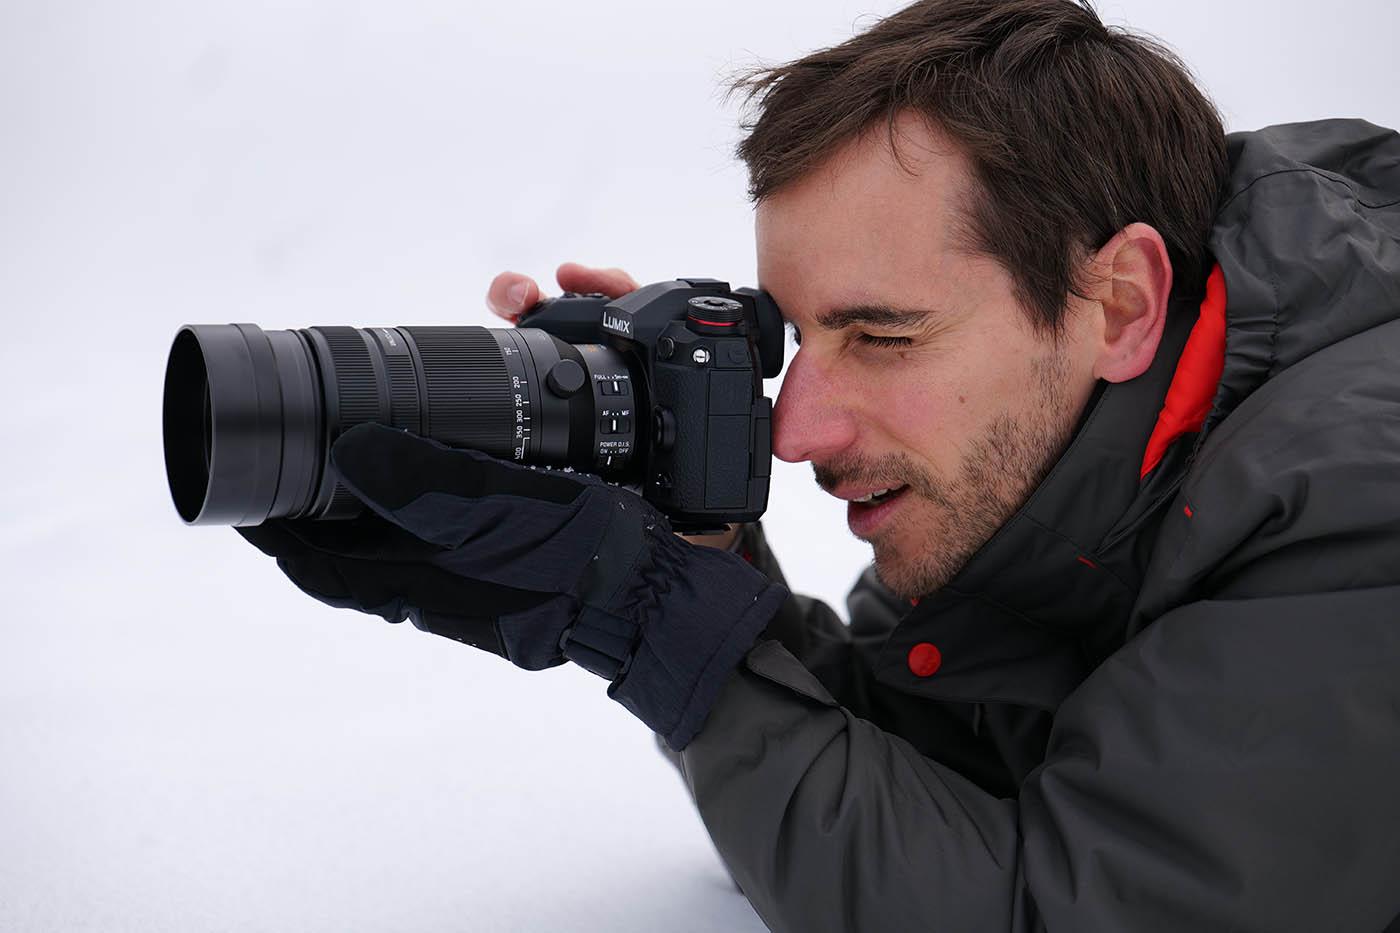 Panasonic Leica 100-400 mm f4-6.7